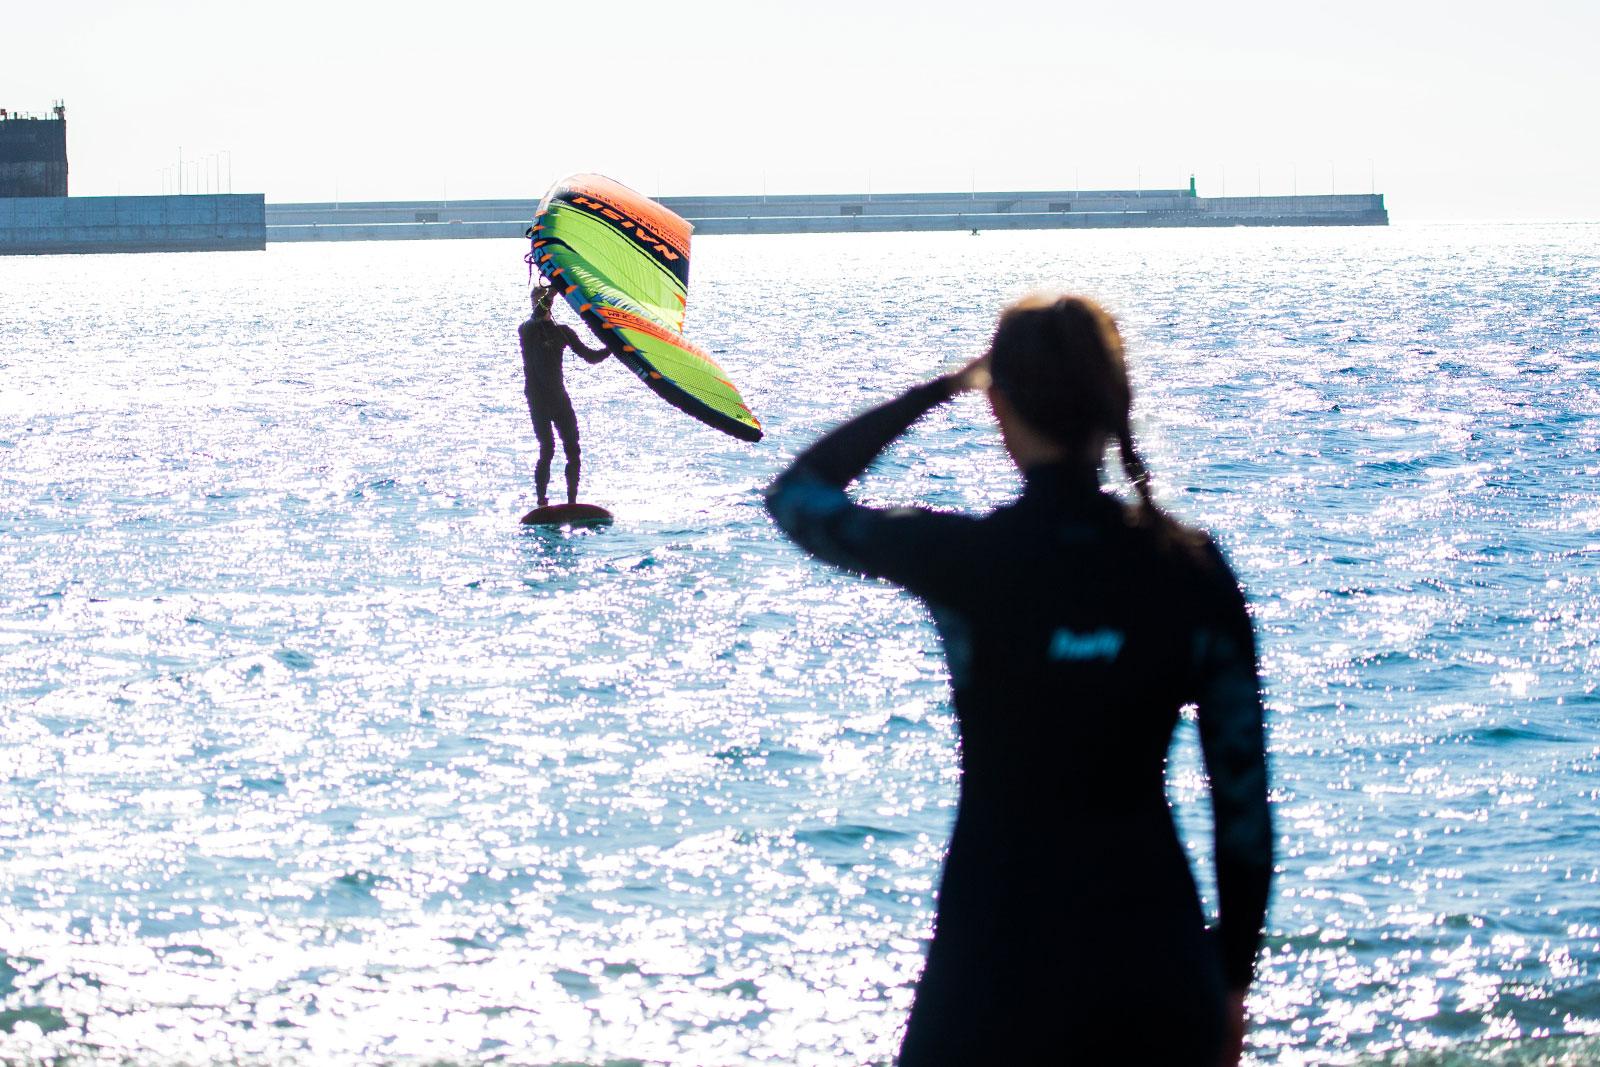 surfhub tenerife - wingfoil6 - WINGFOIL / SURF / SUP